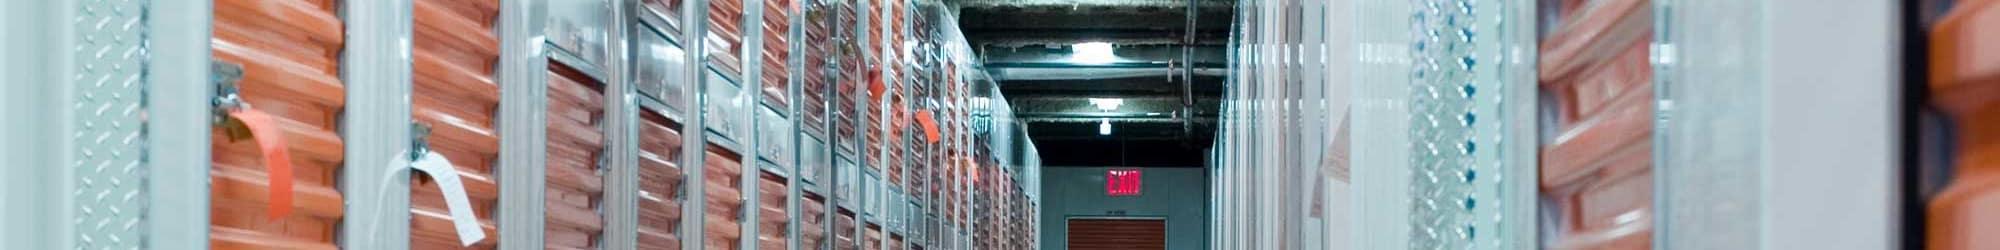 Car storage in Grand Blanc